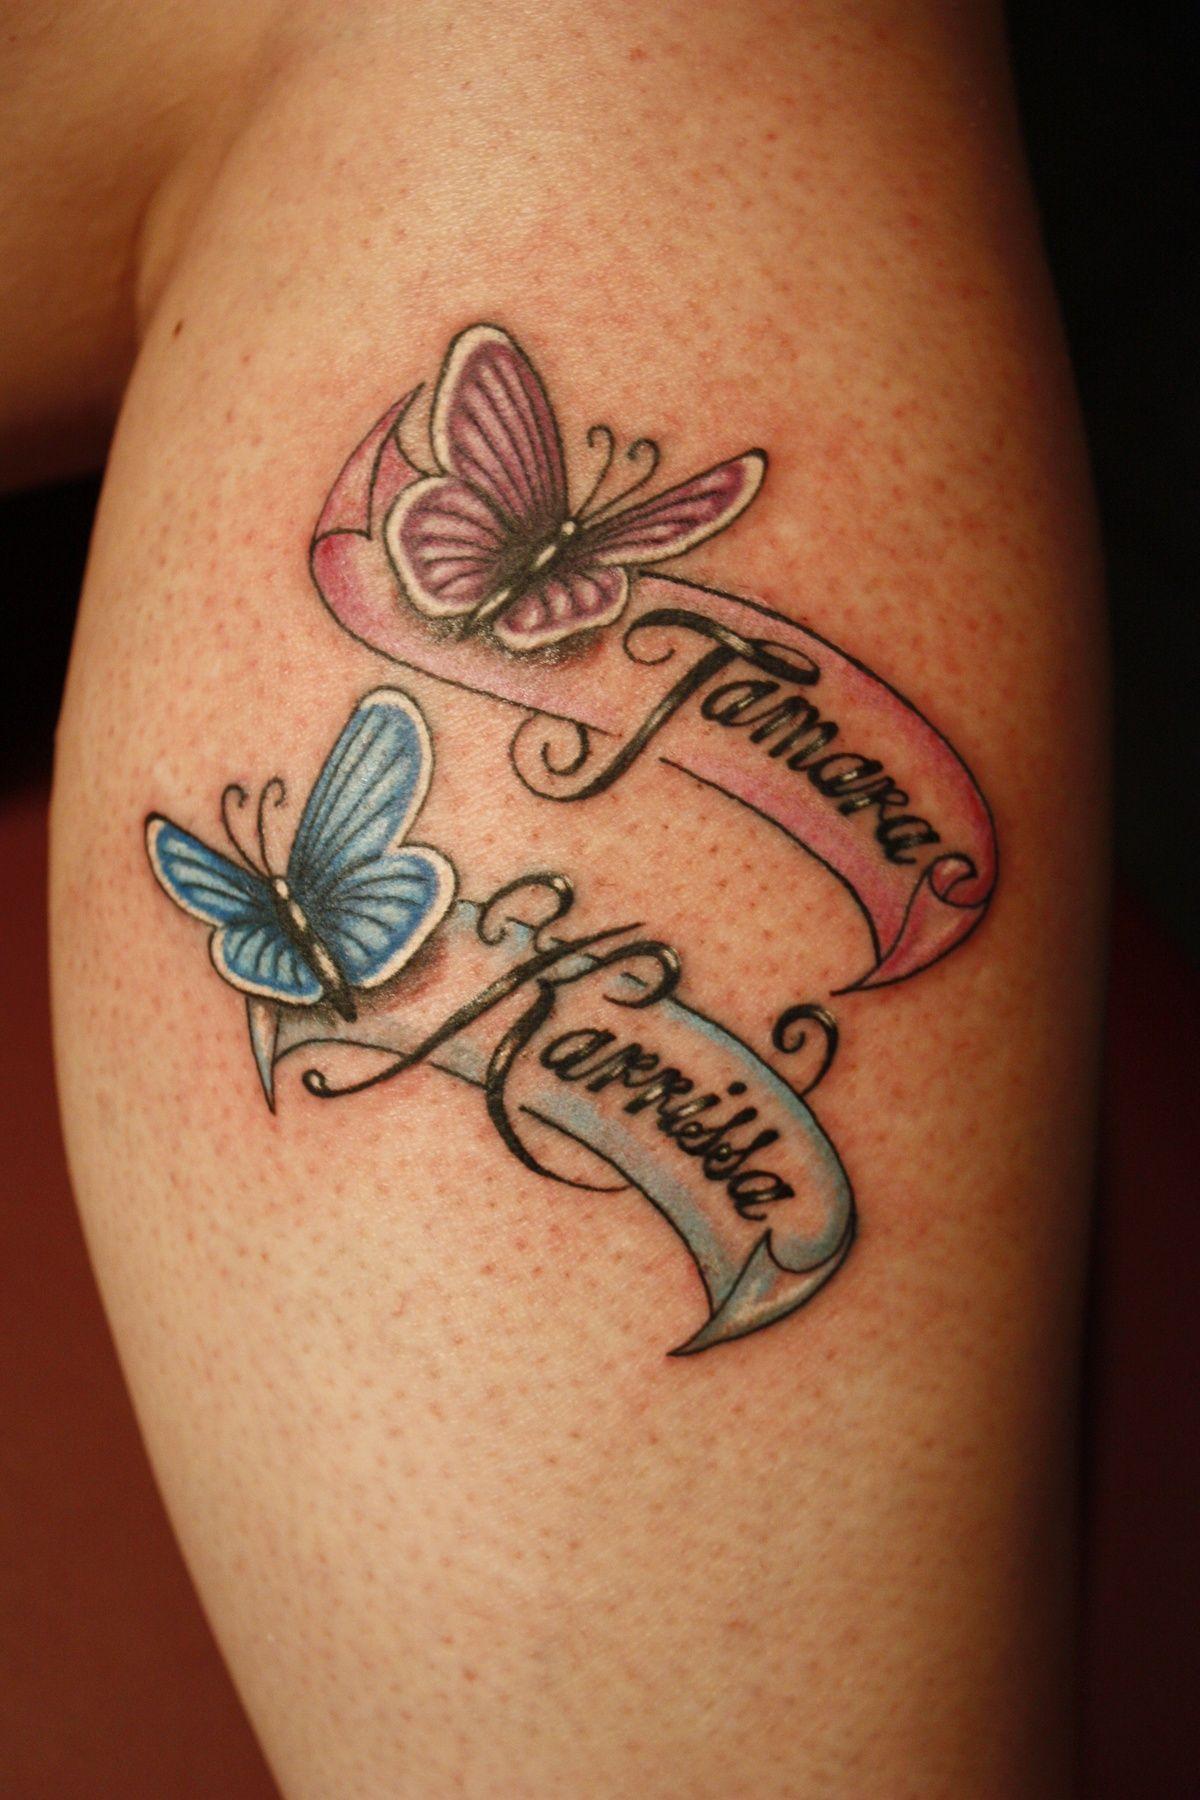 Small name tattoo ideas pin by tina wright on tattoos  pinterest  tattoo tatoos and tatting